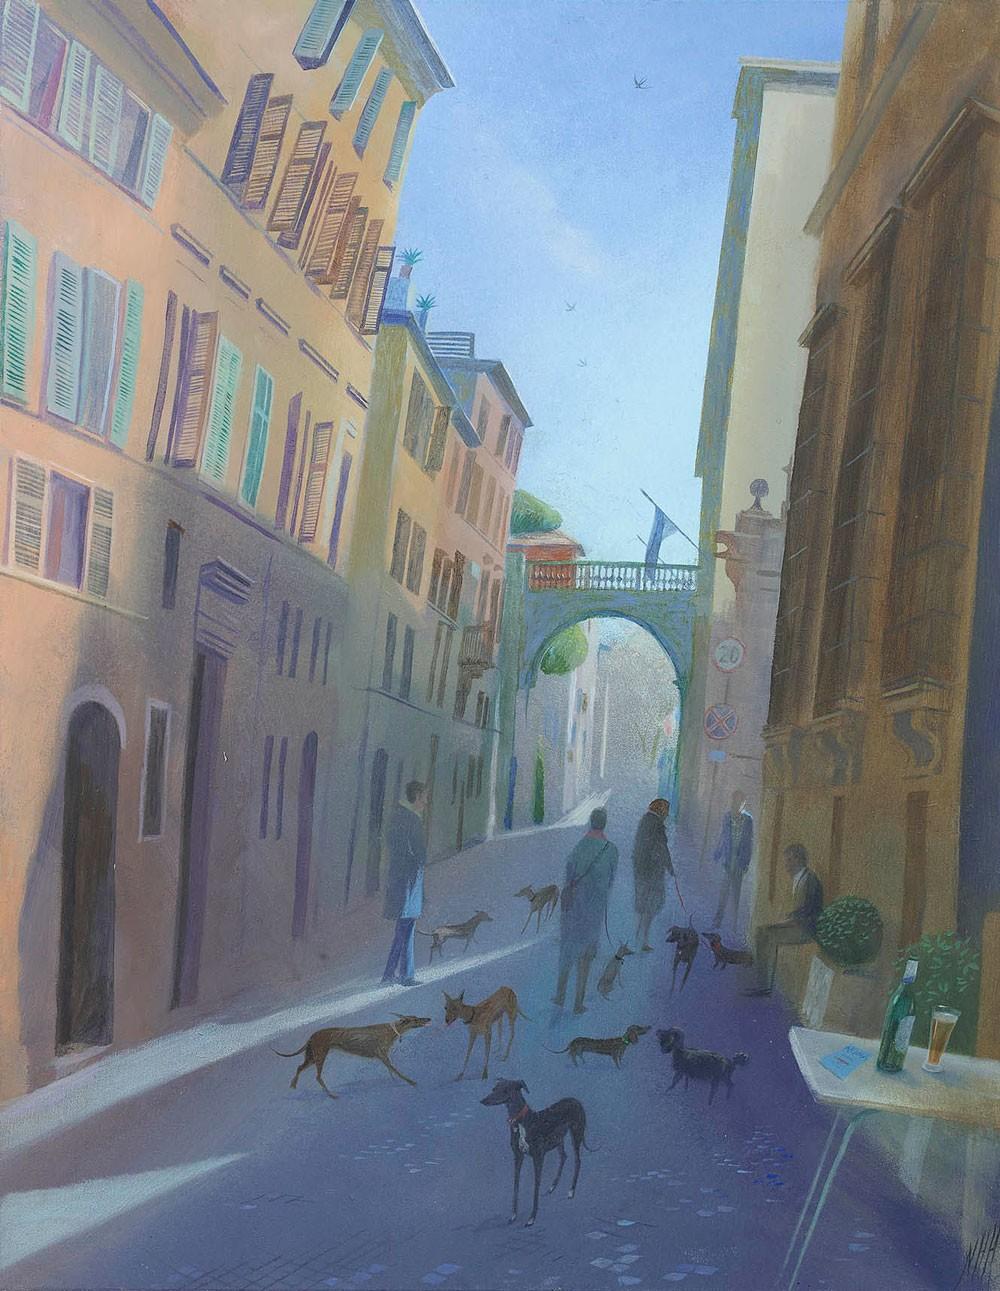 The Dog Walkers of Via Giulia